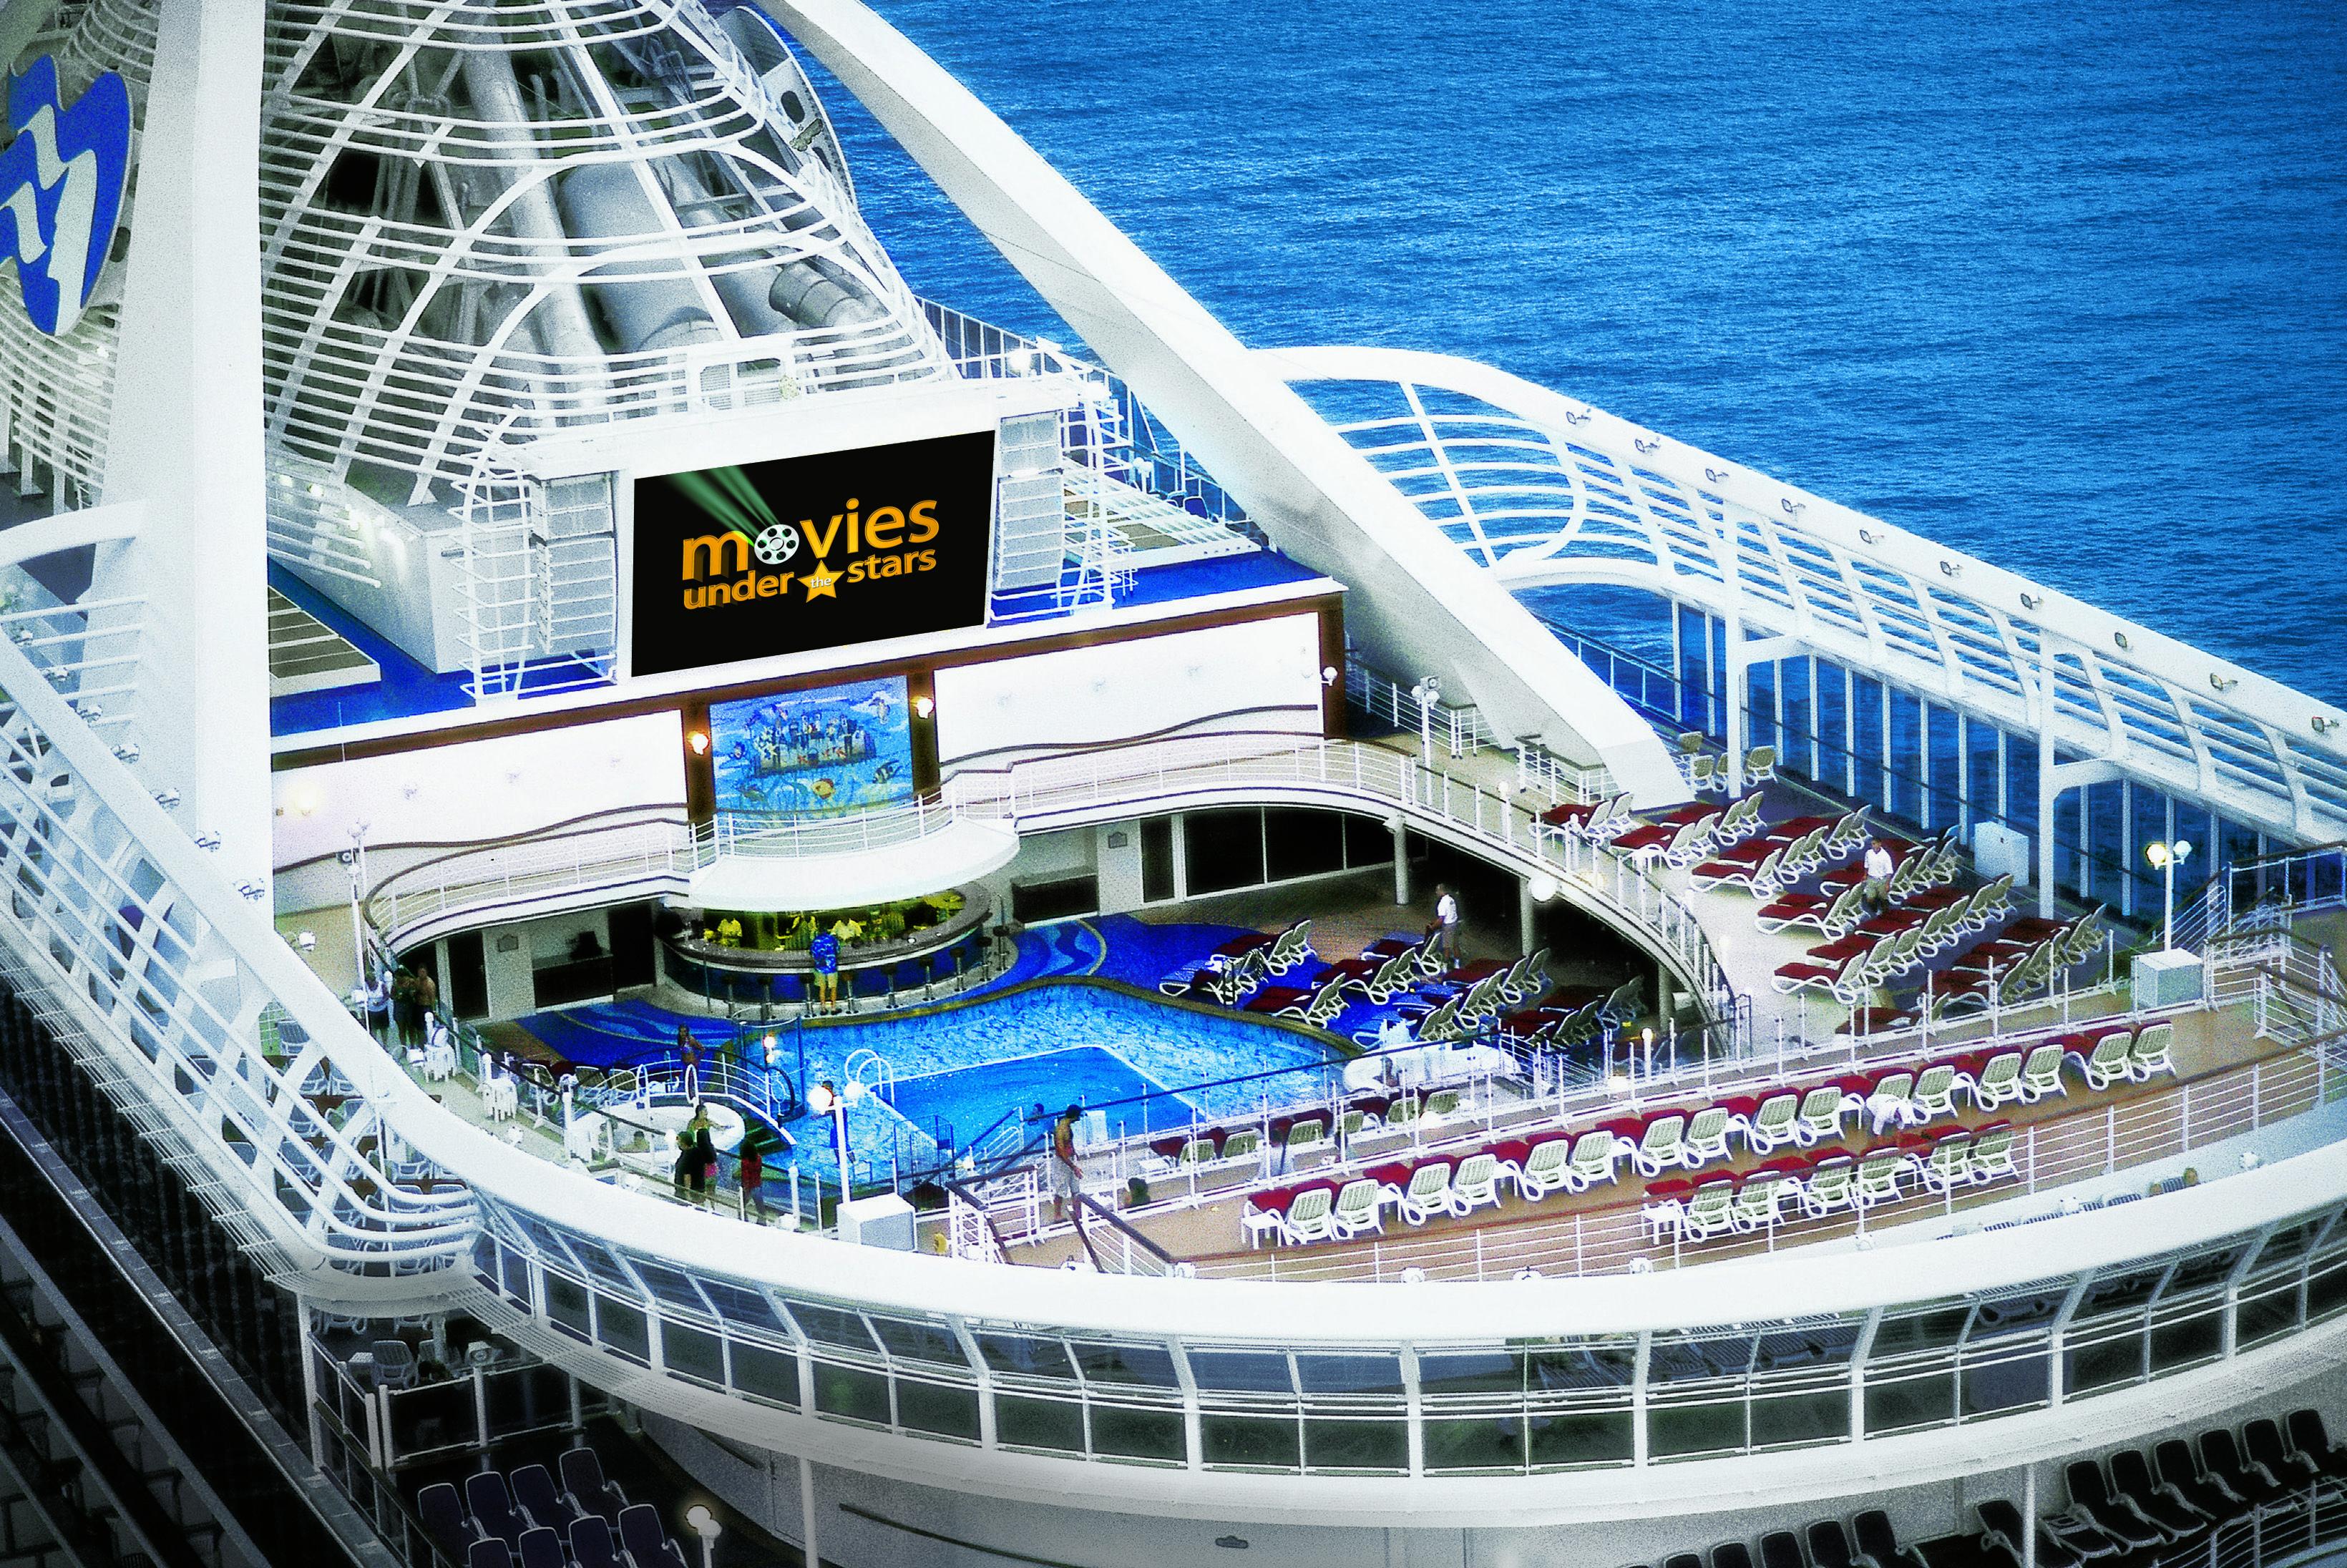 Movie Screening At Sea Onboard Princess Cruises Onboard